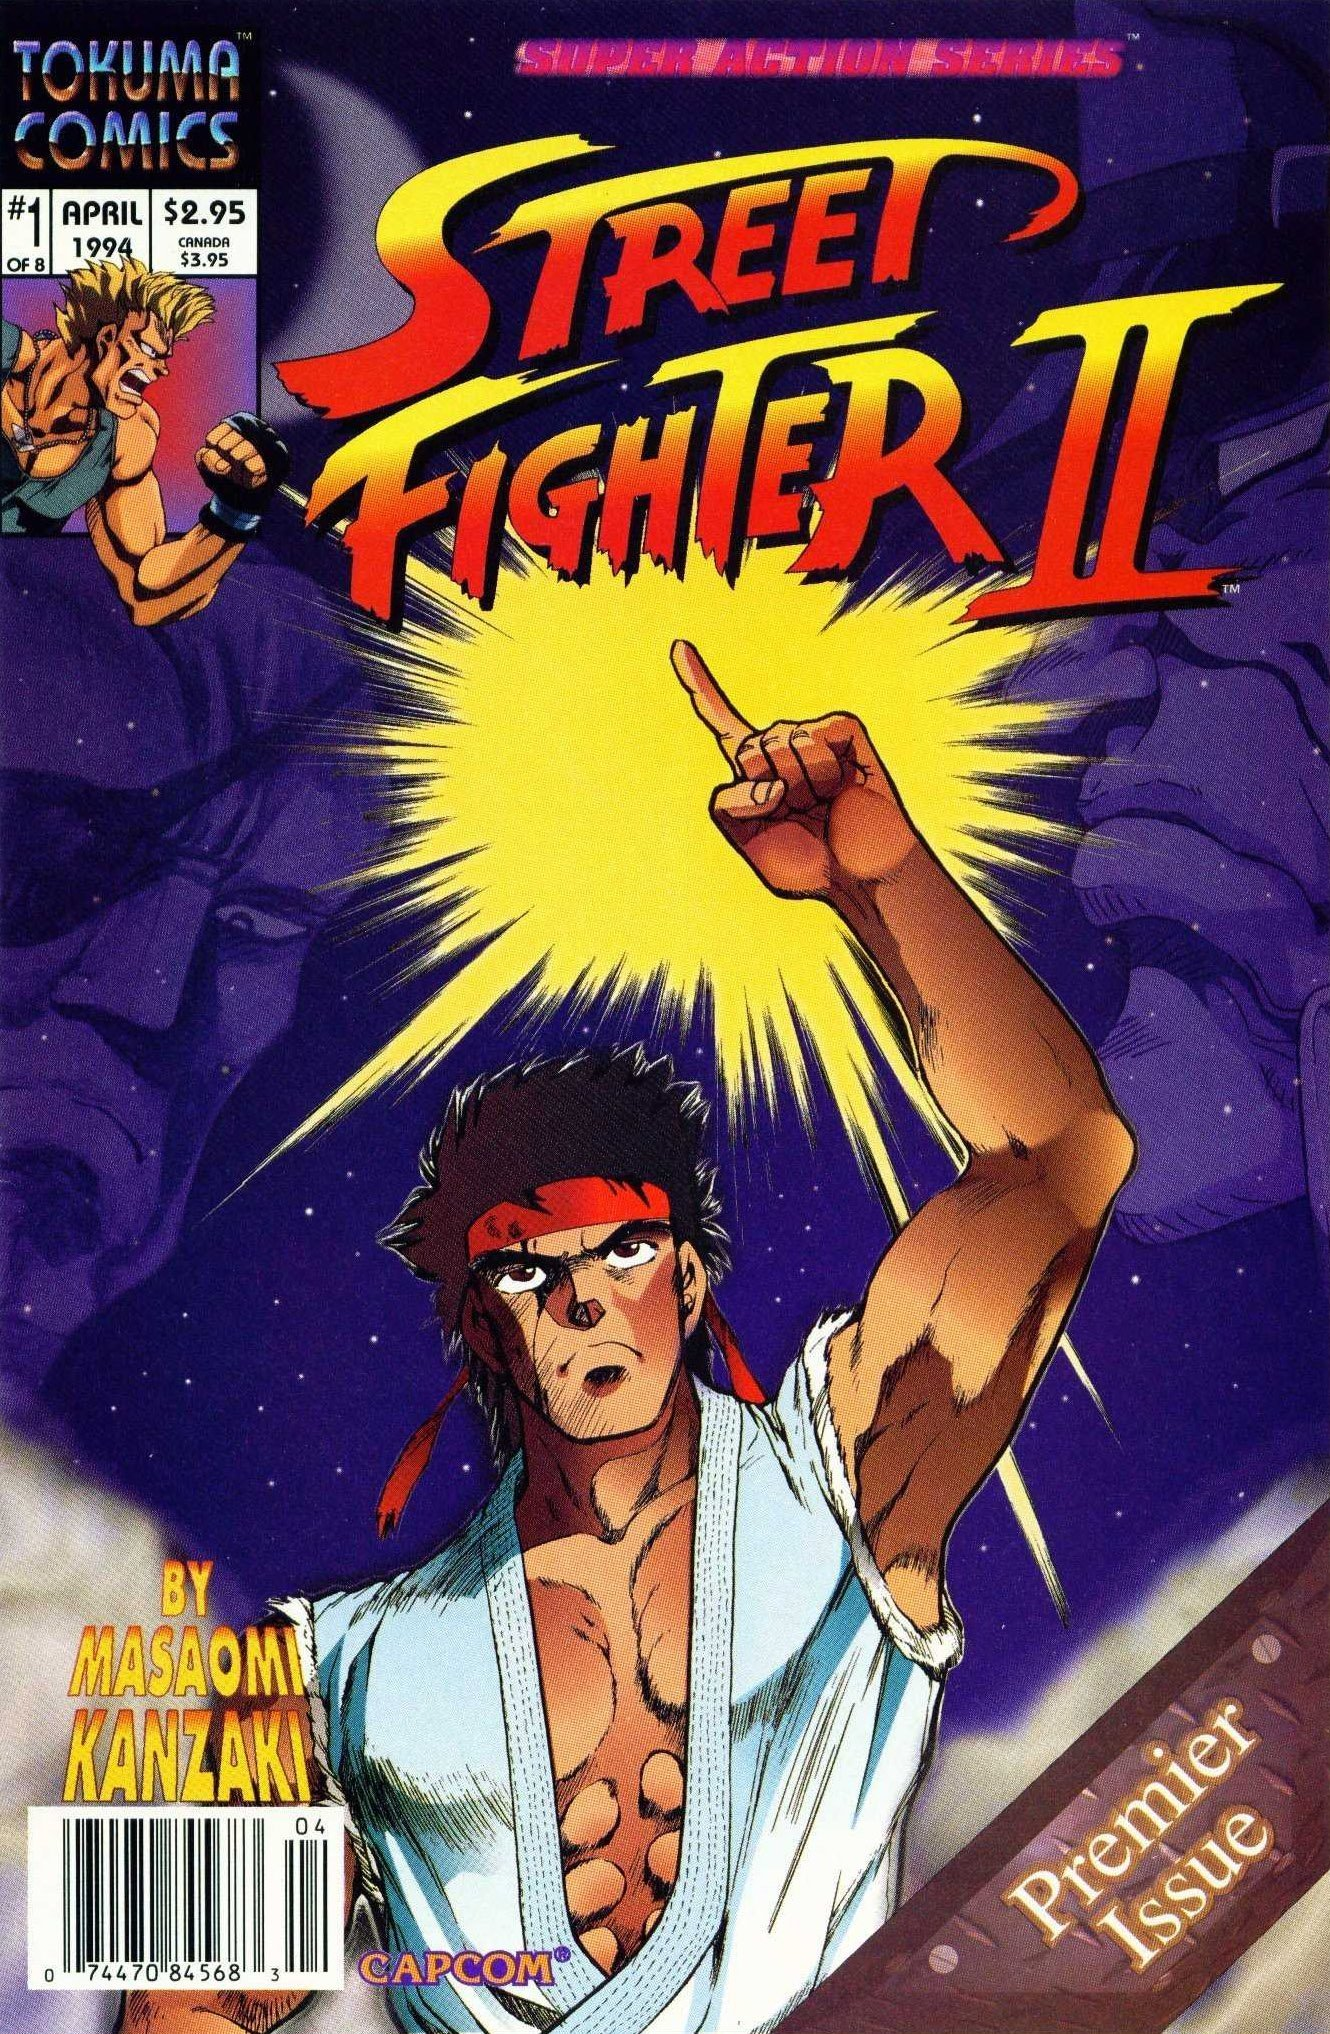 Street Fighter II 01 (April 1994)